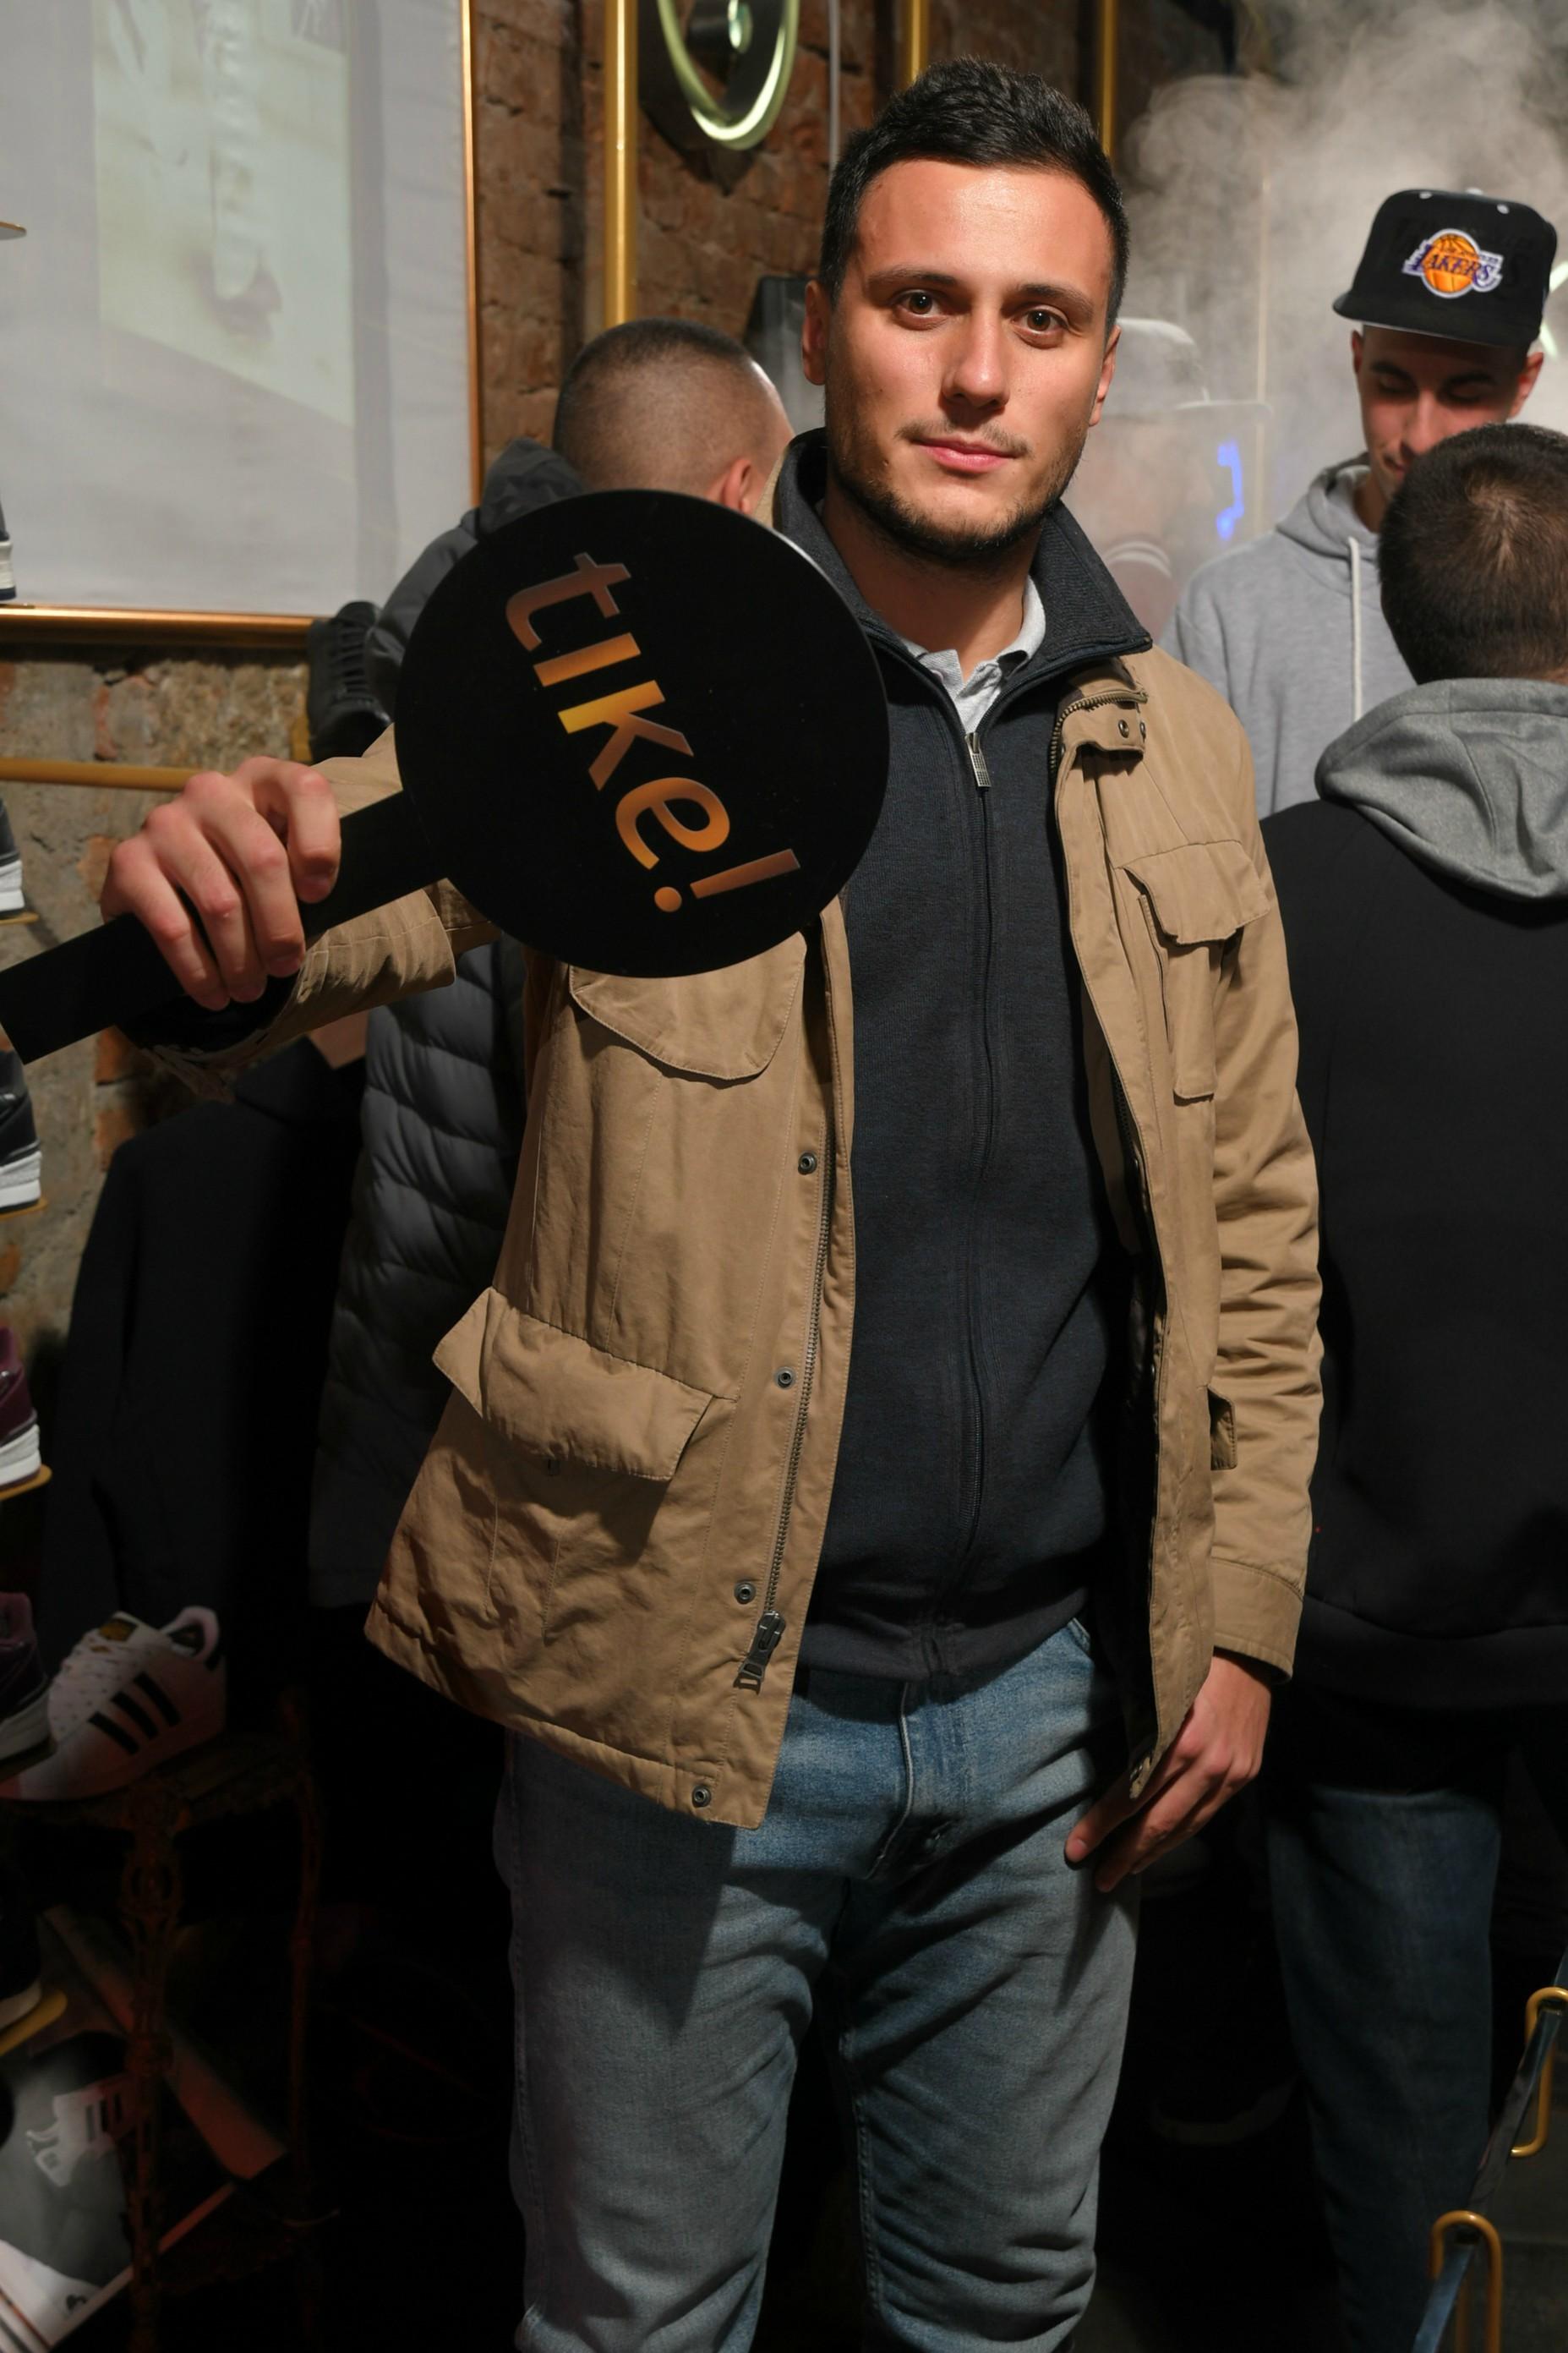 Glumac Nikola Glisic Nezaboravan prvi rođendan Tike Shop a